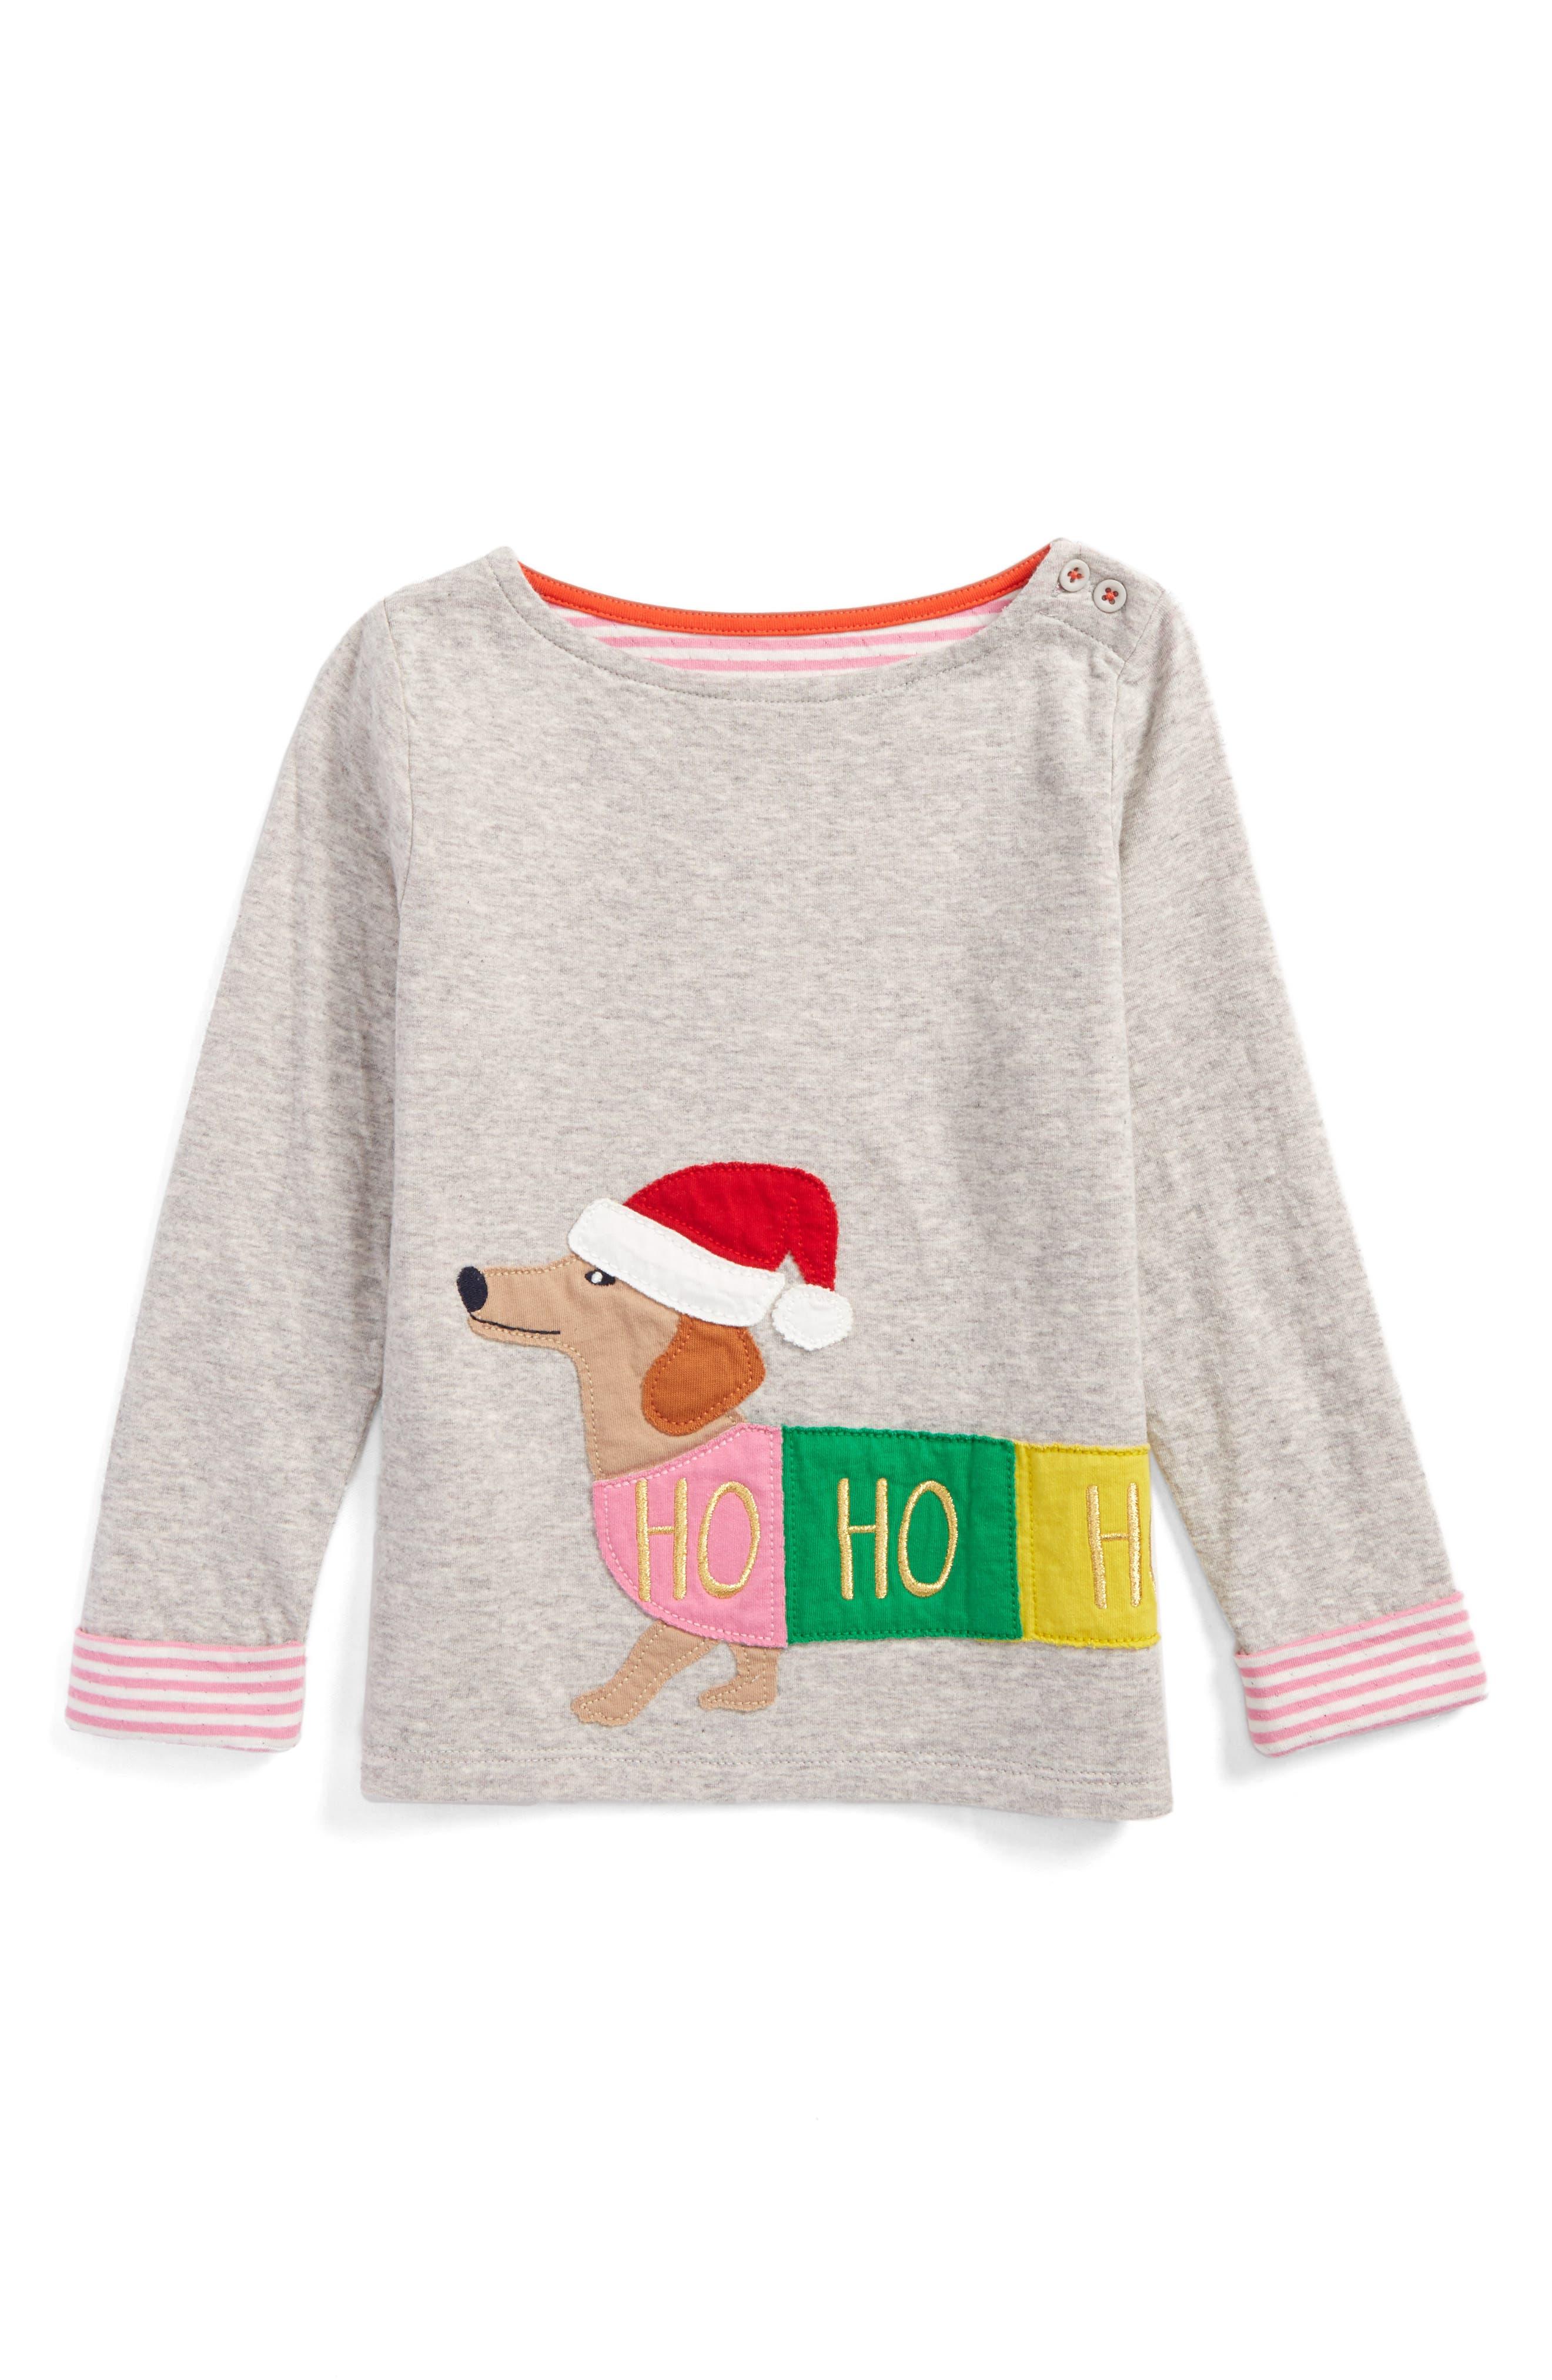 Main Image - Mini Boden Cosy Appliqué Tee (Toddler Girls, Little Girls & Big Girls)